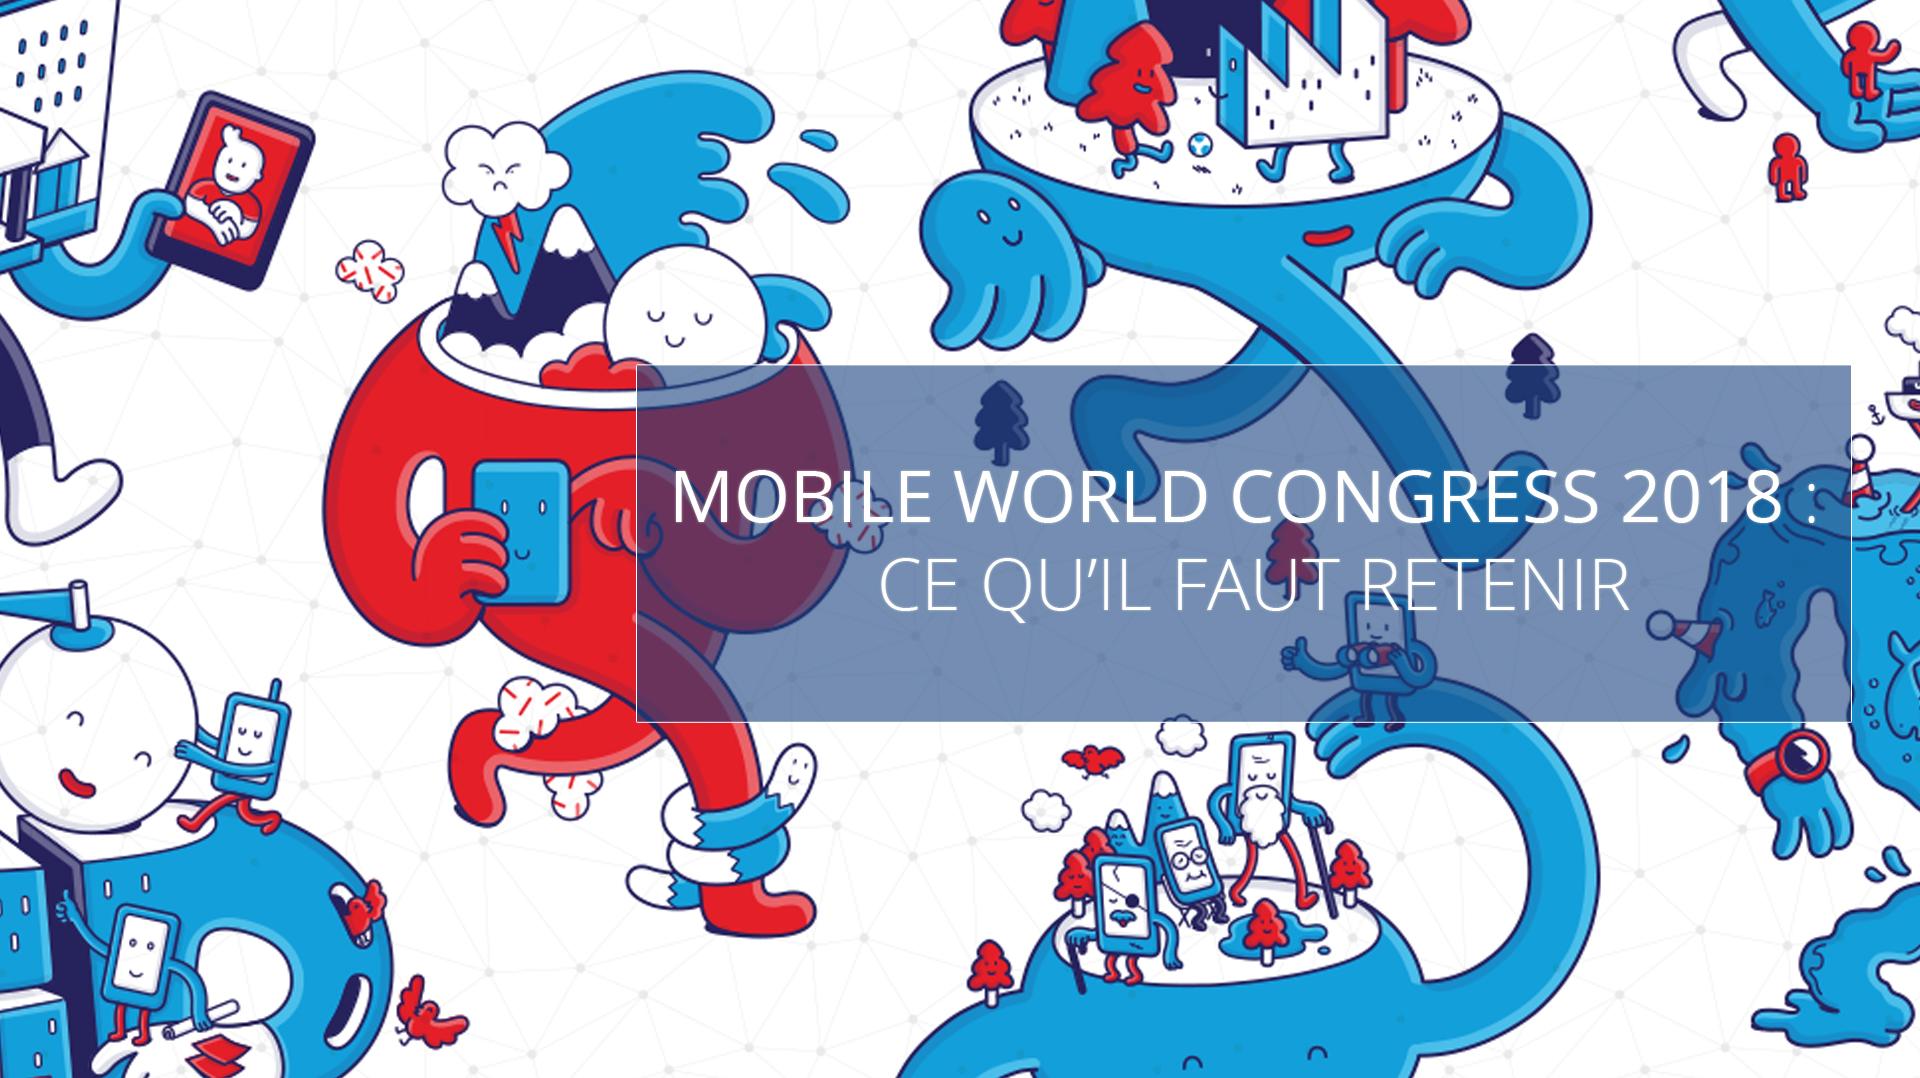 Mobile World Congress 2018 : ce qu'il faut retenir